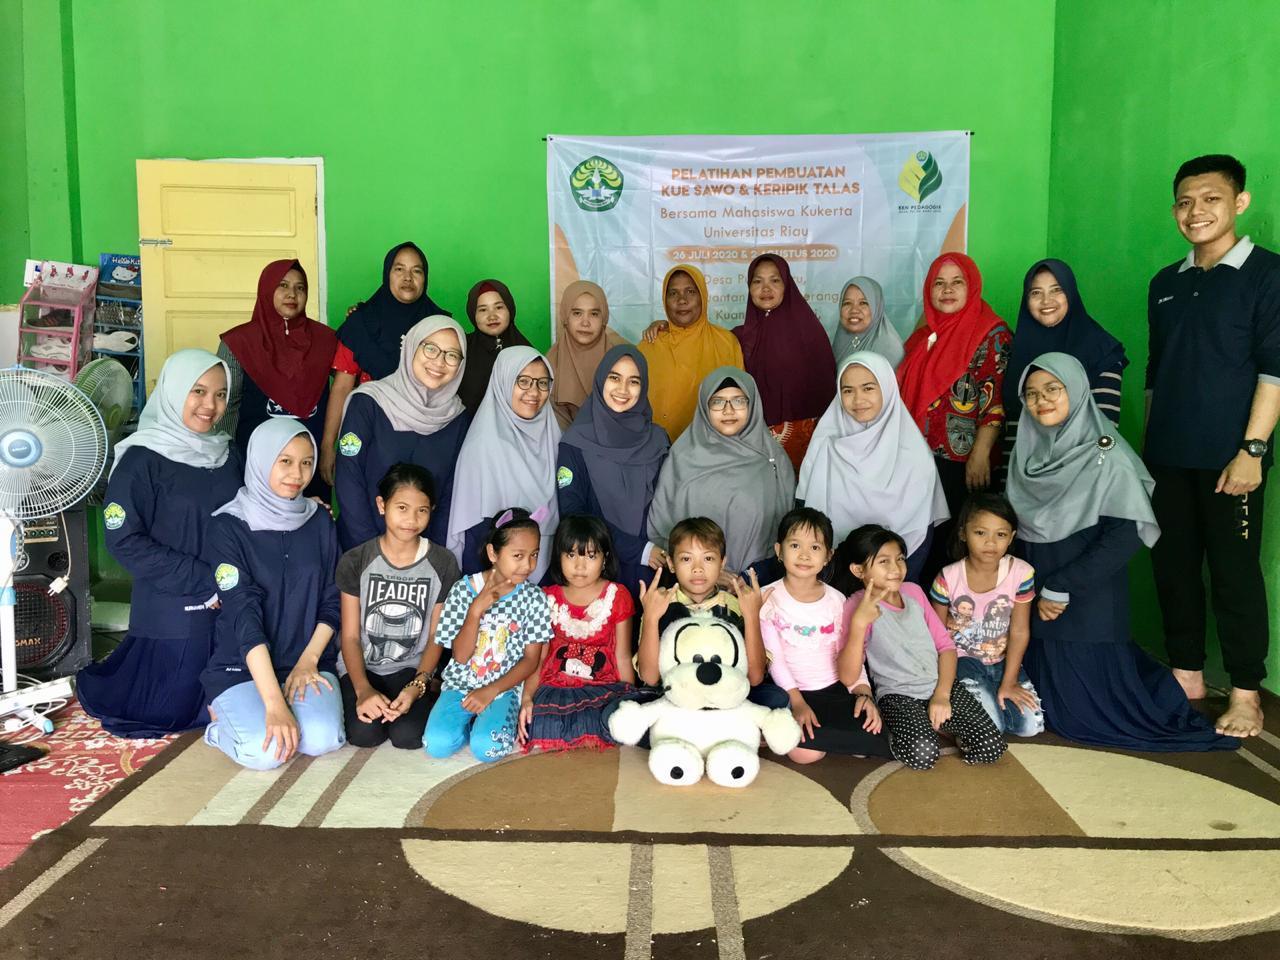 KKN Pedagogik Unri Desa Pulau Baru Gali Potensi Kue Sawo dan Keripik Talas